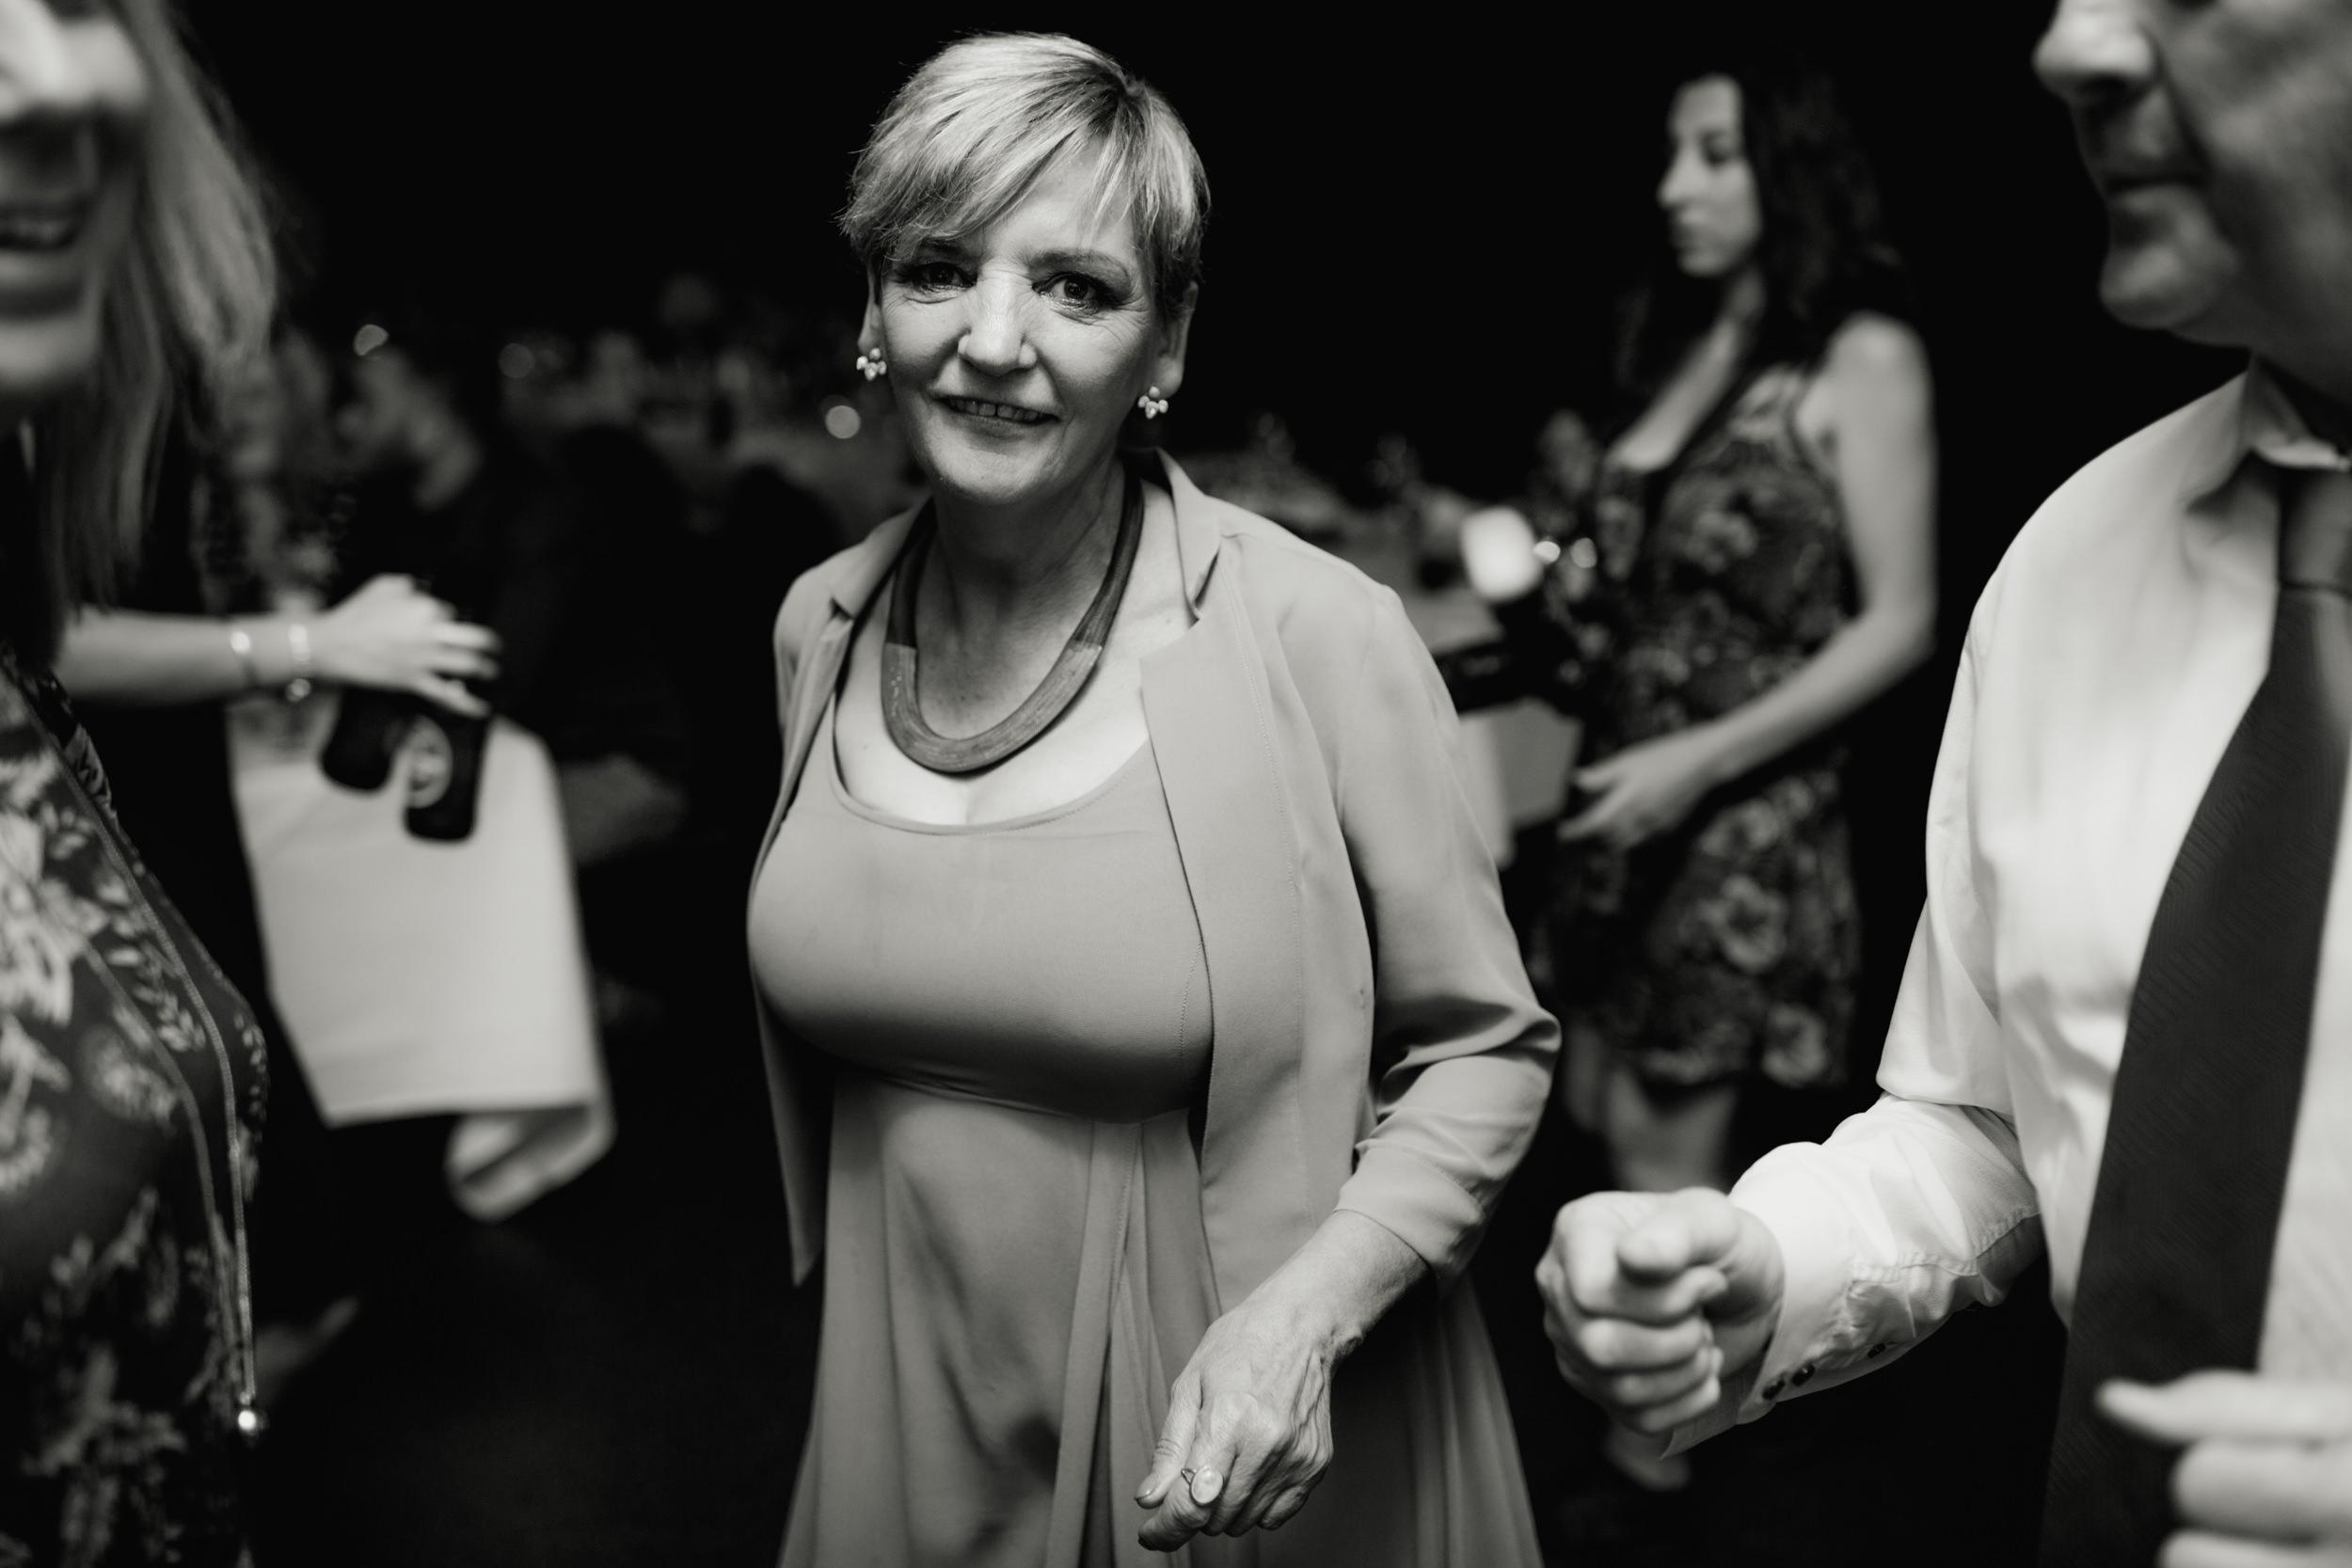 I-Got-You-Babe-Weddings-Hayley-Sam-NGV-Melbourne0151.JPG